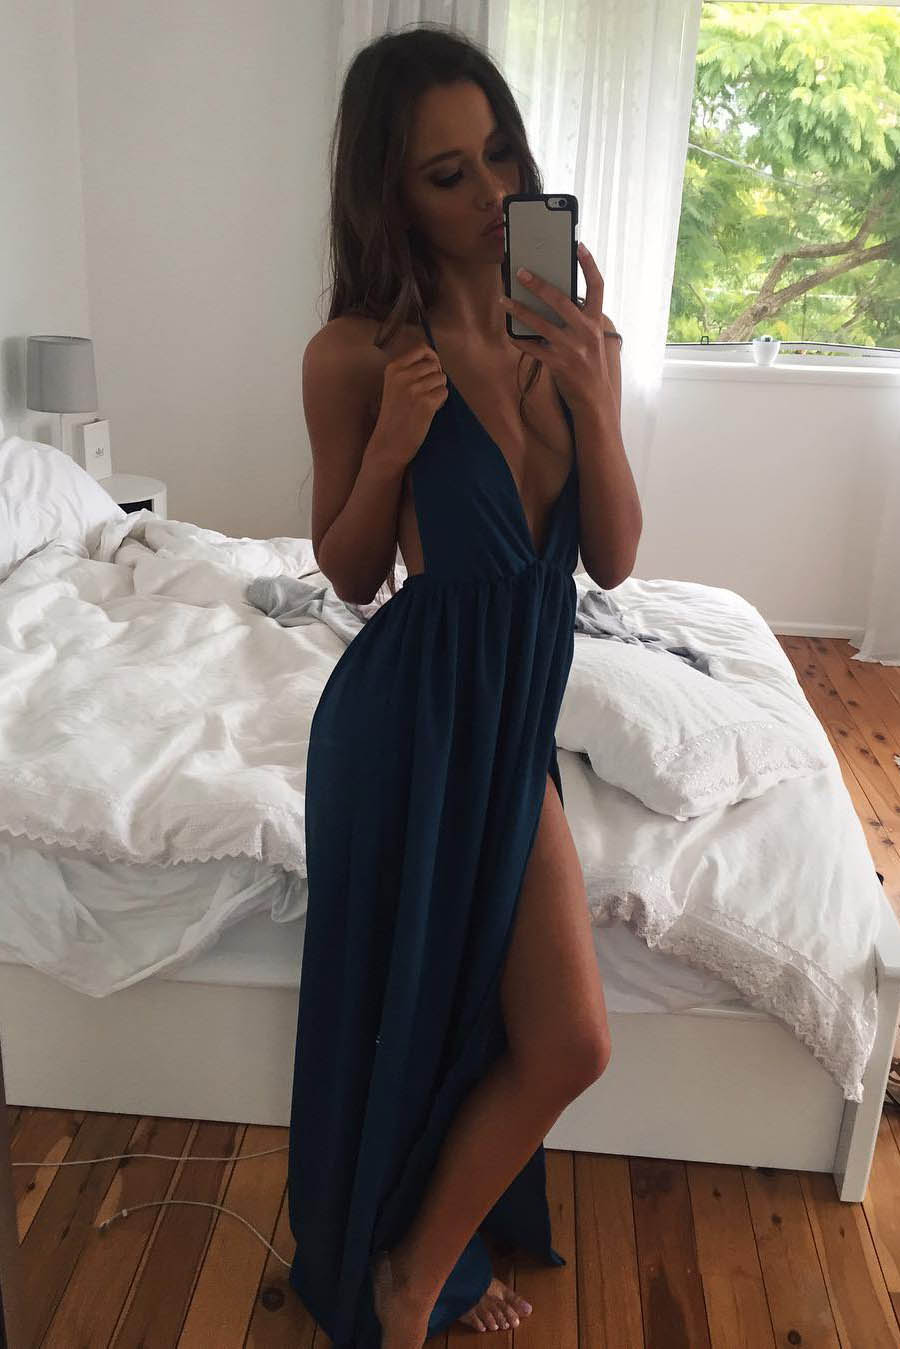 Model Olesya